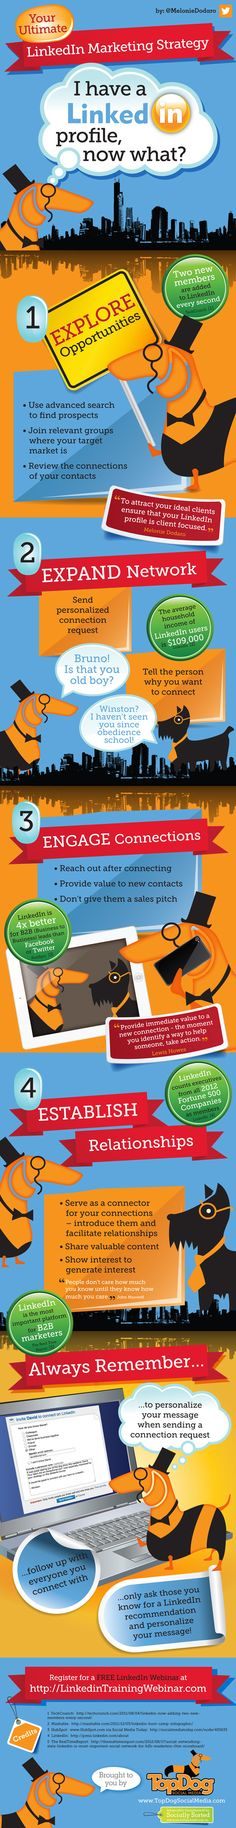 LinkedIn Marketing #Infographic #LinkedIn #Marketing #SMM #SocialMedia